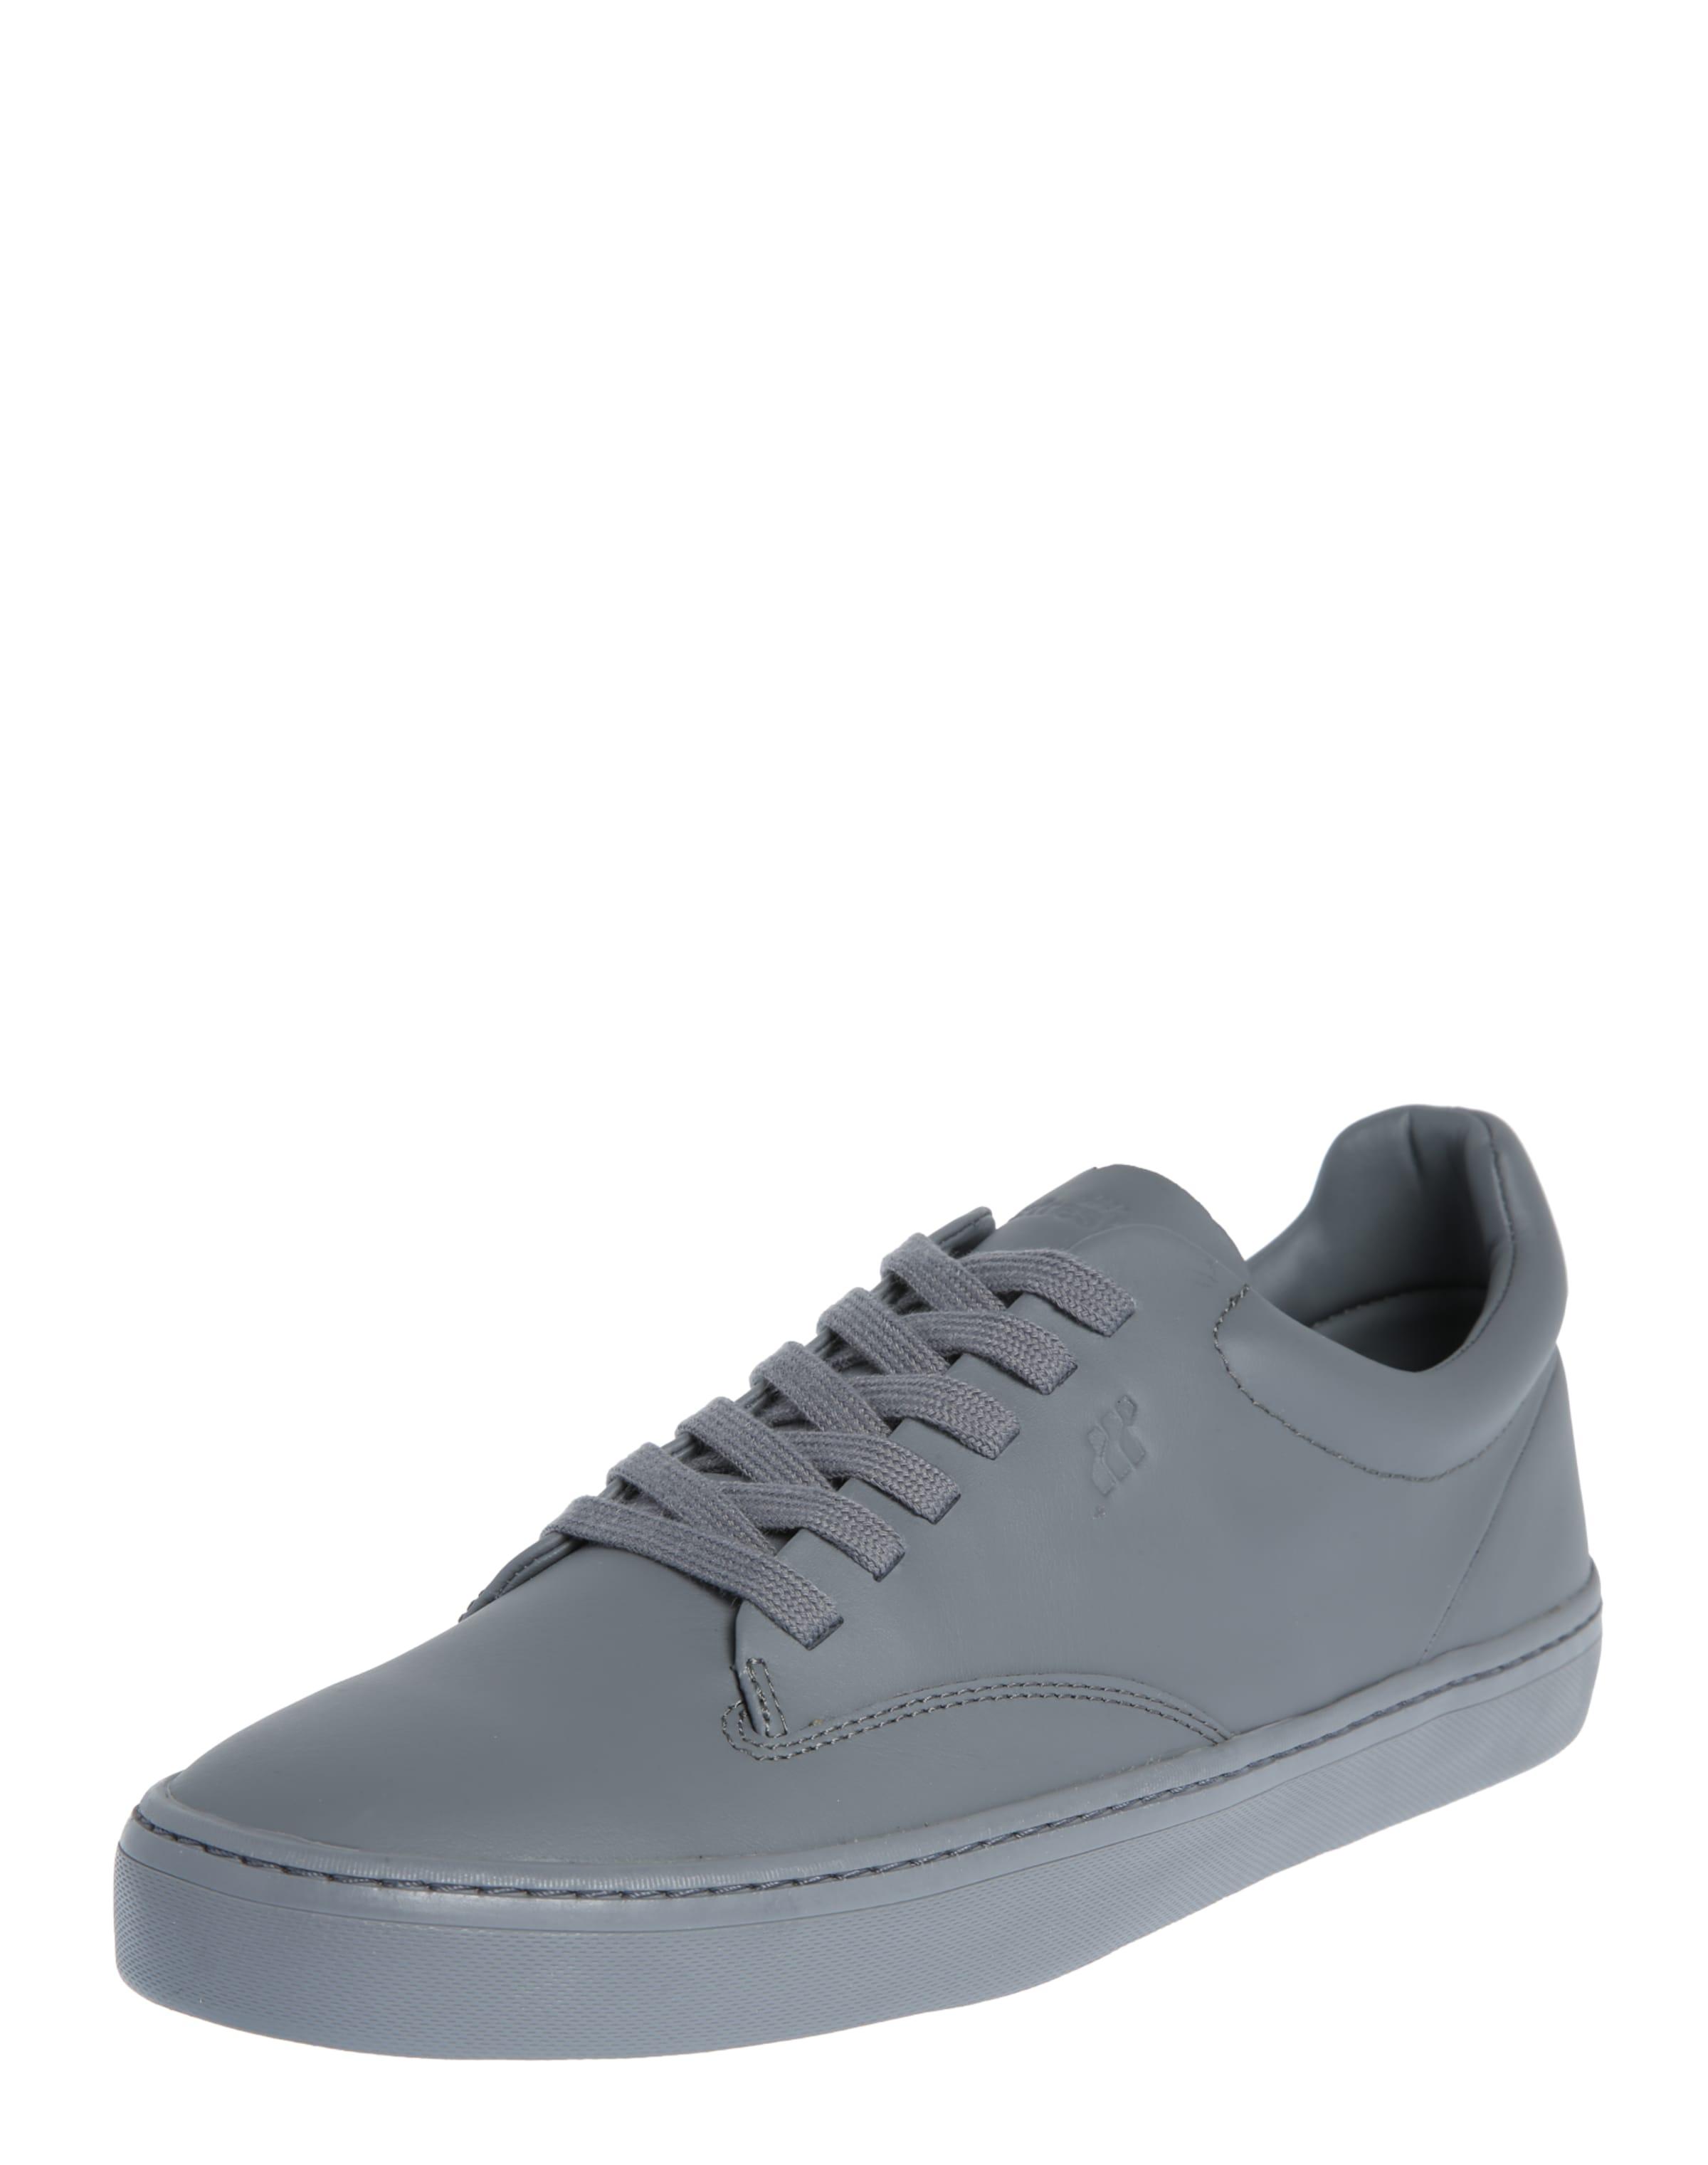 BOXFRESH Edler Sneaker Günstige und langlebige Schuhe